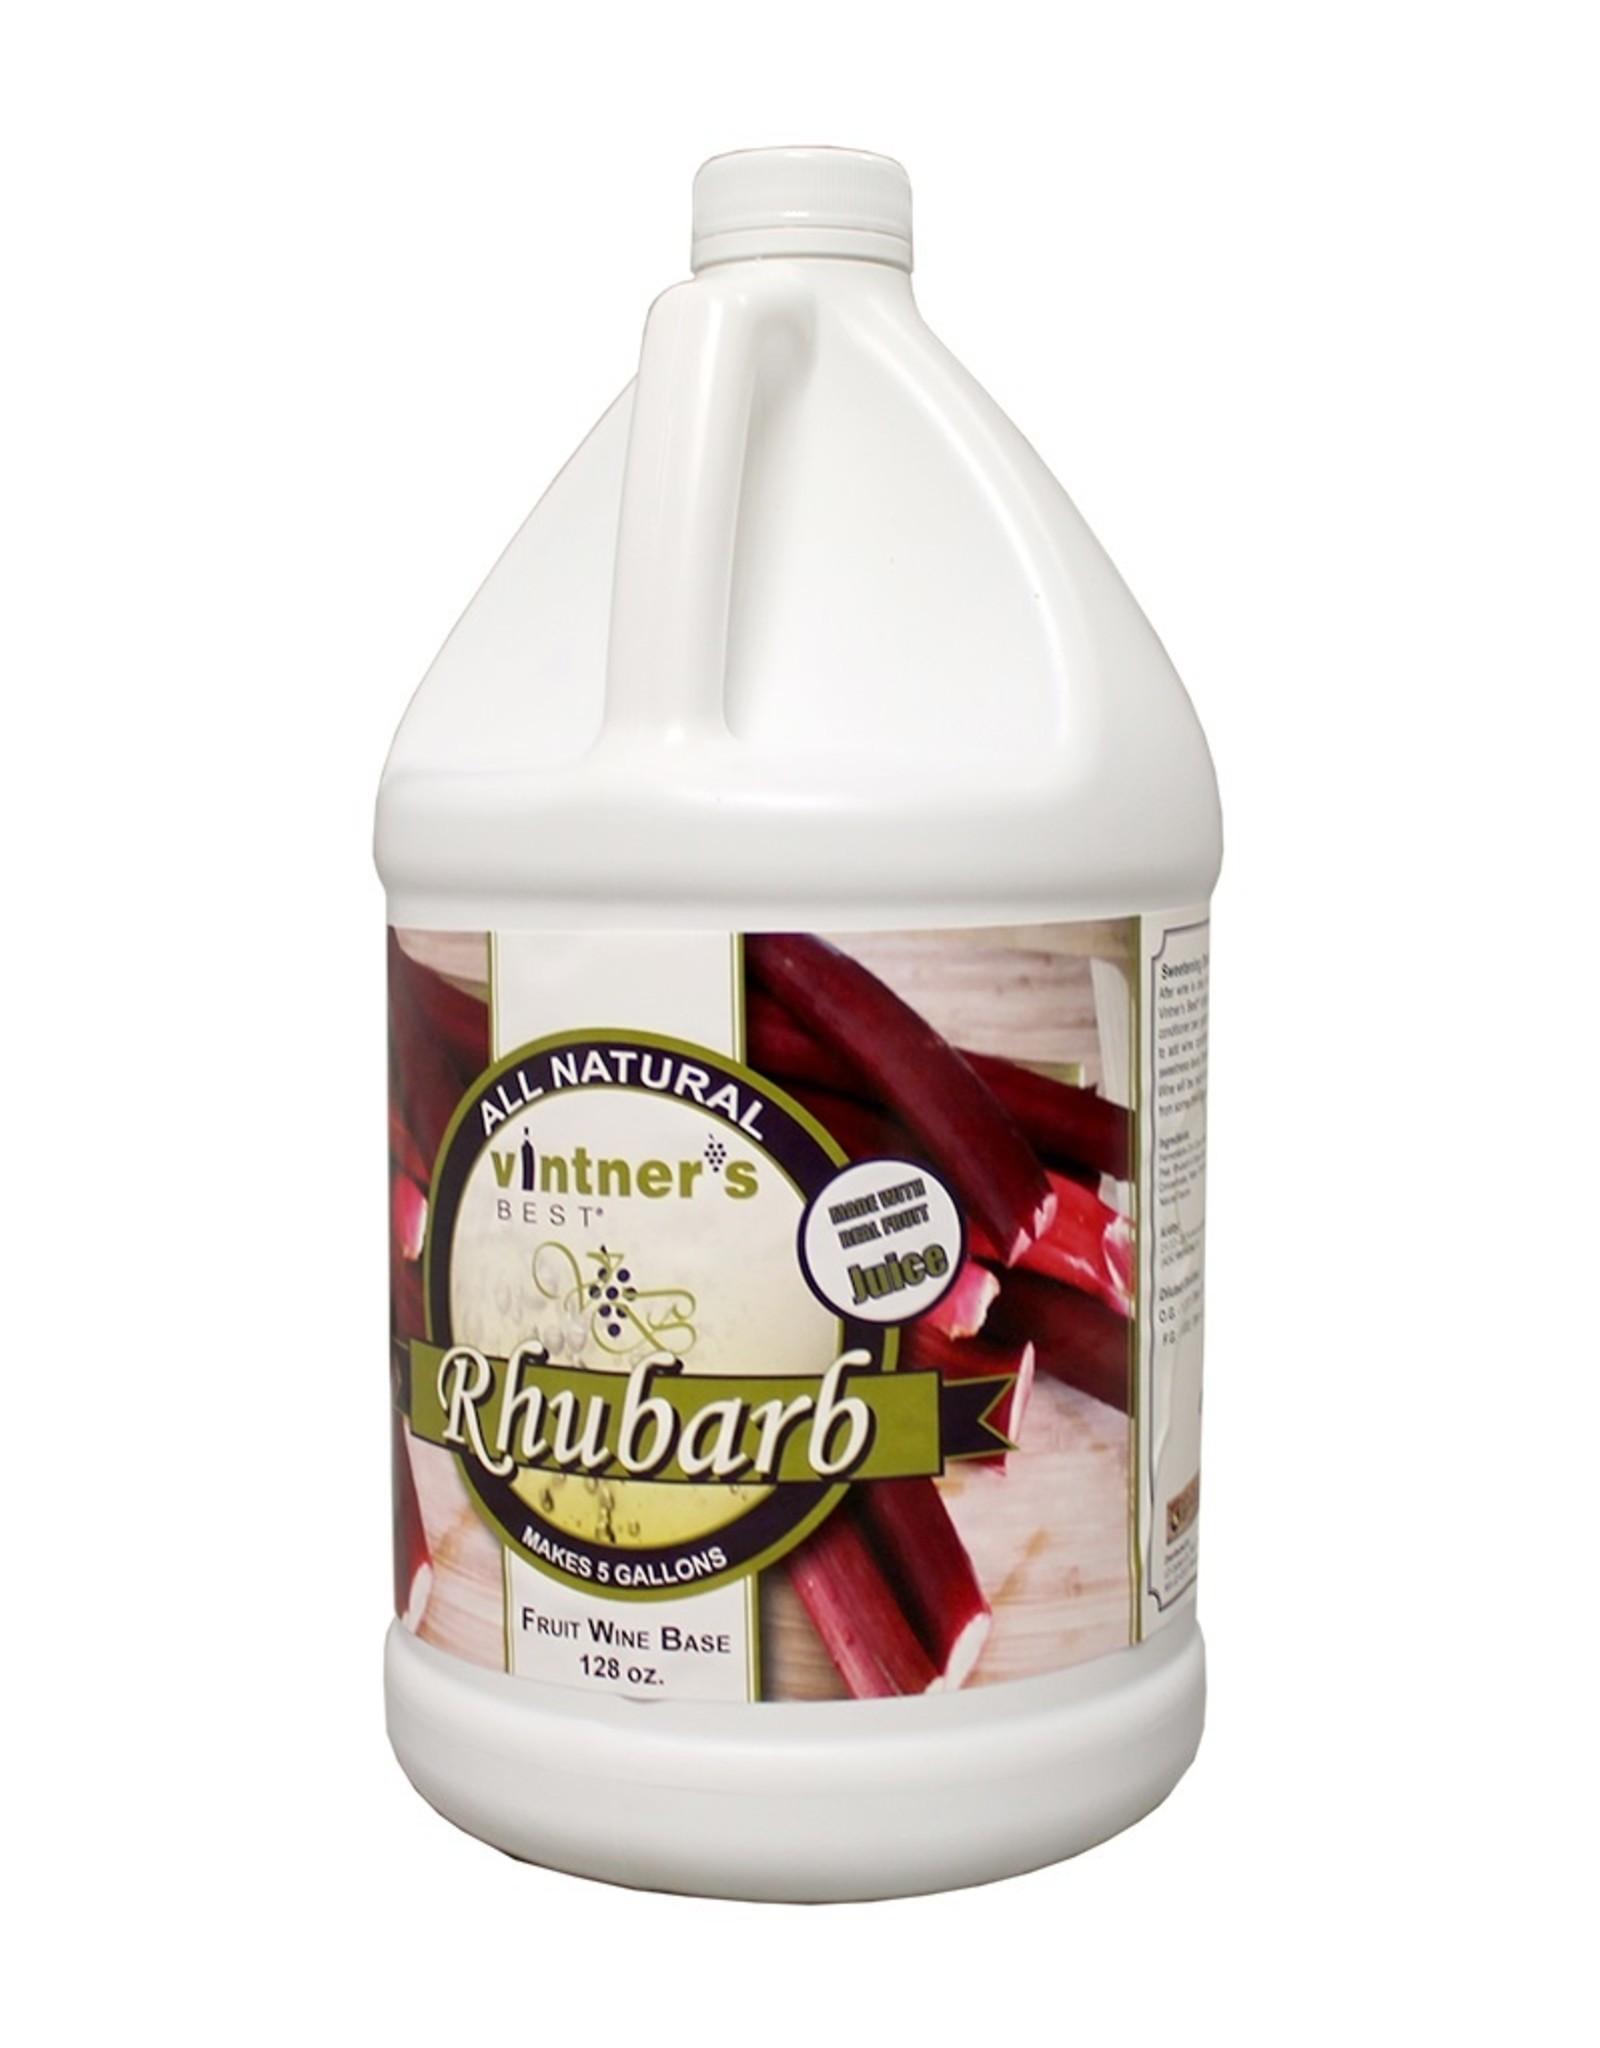 RHUBARB FRUIT WINE BASE 128 OZ (1 GALLON)